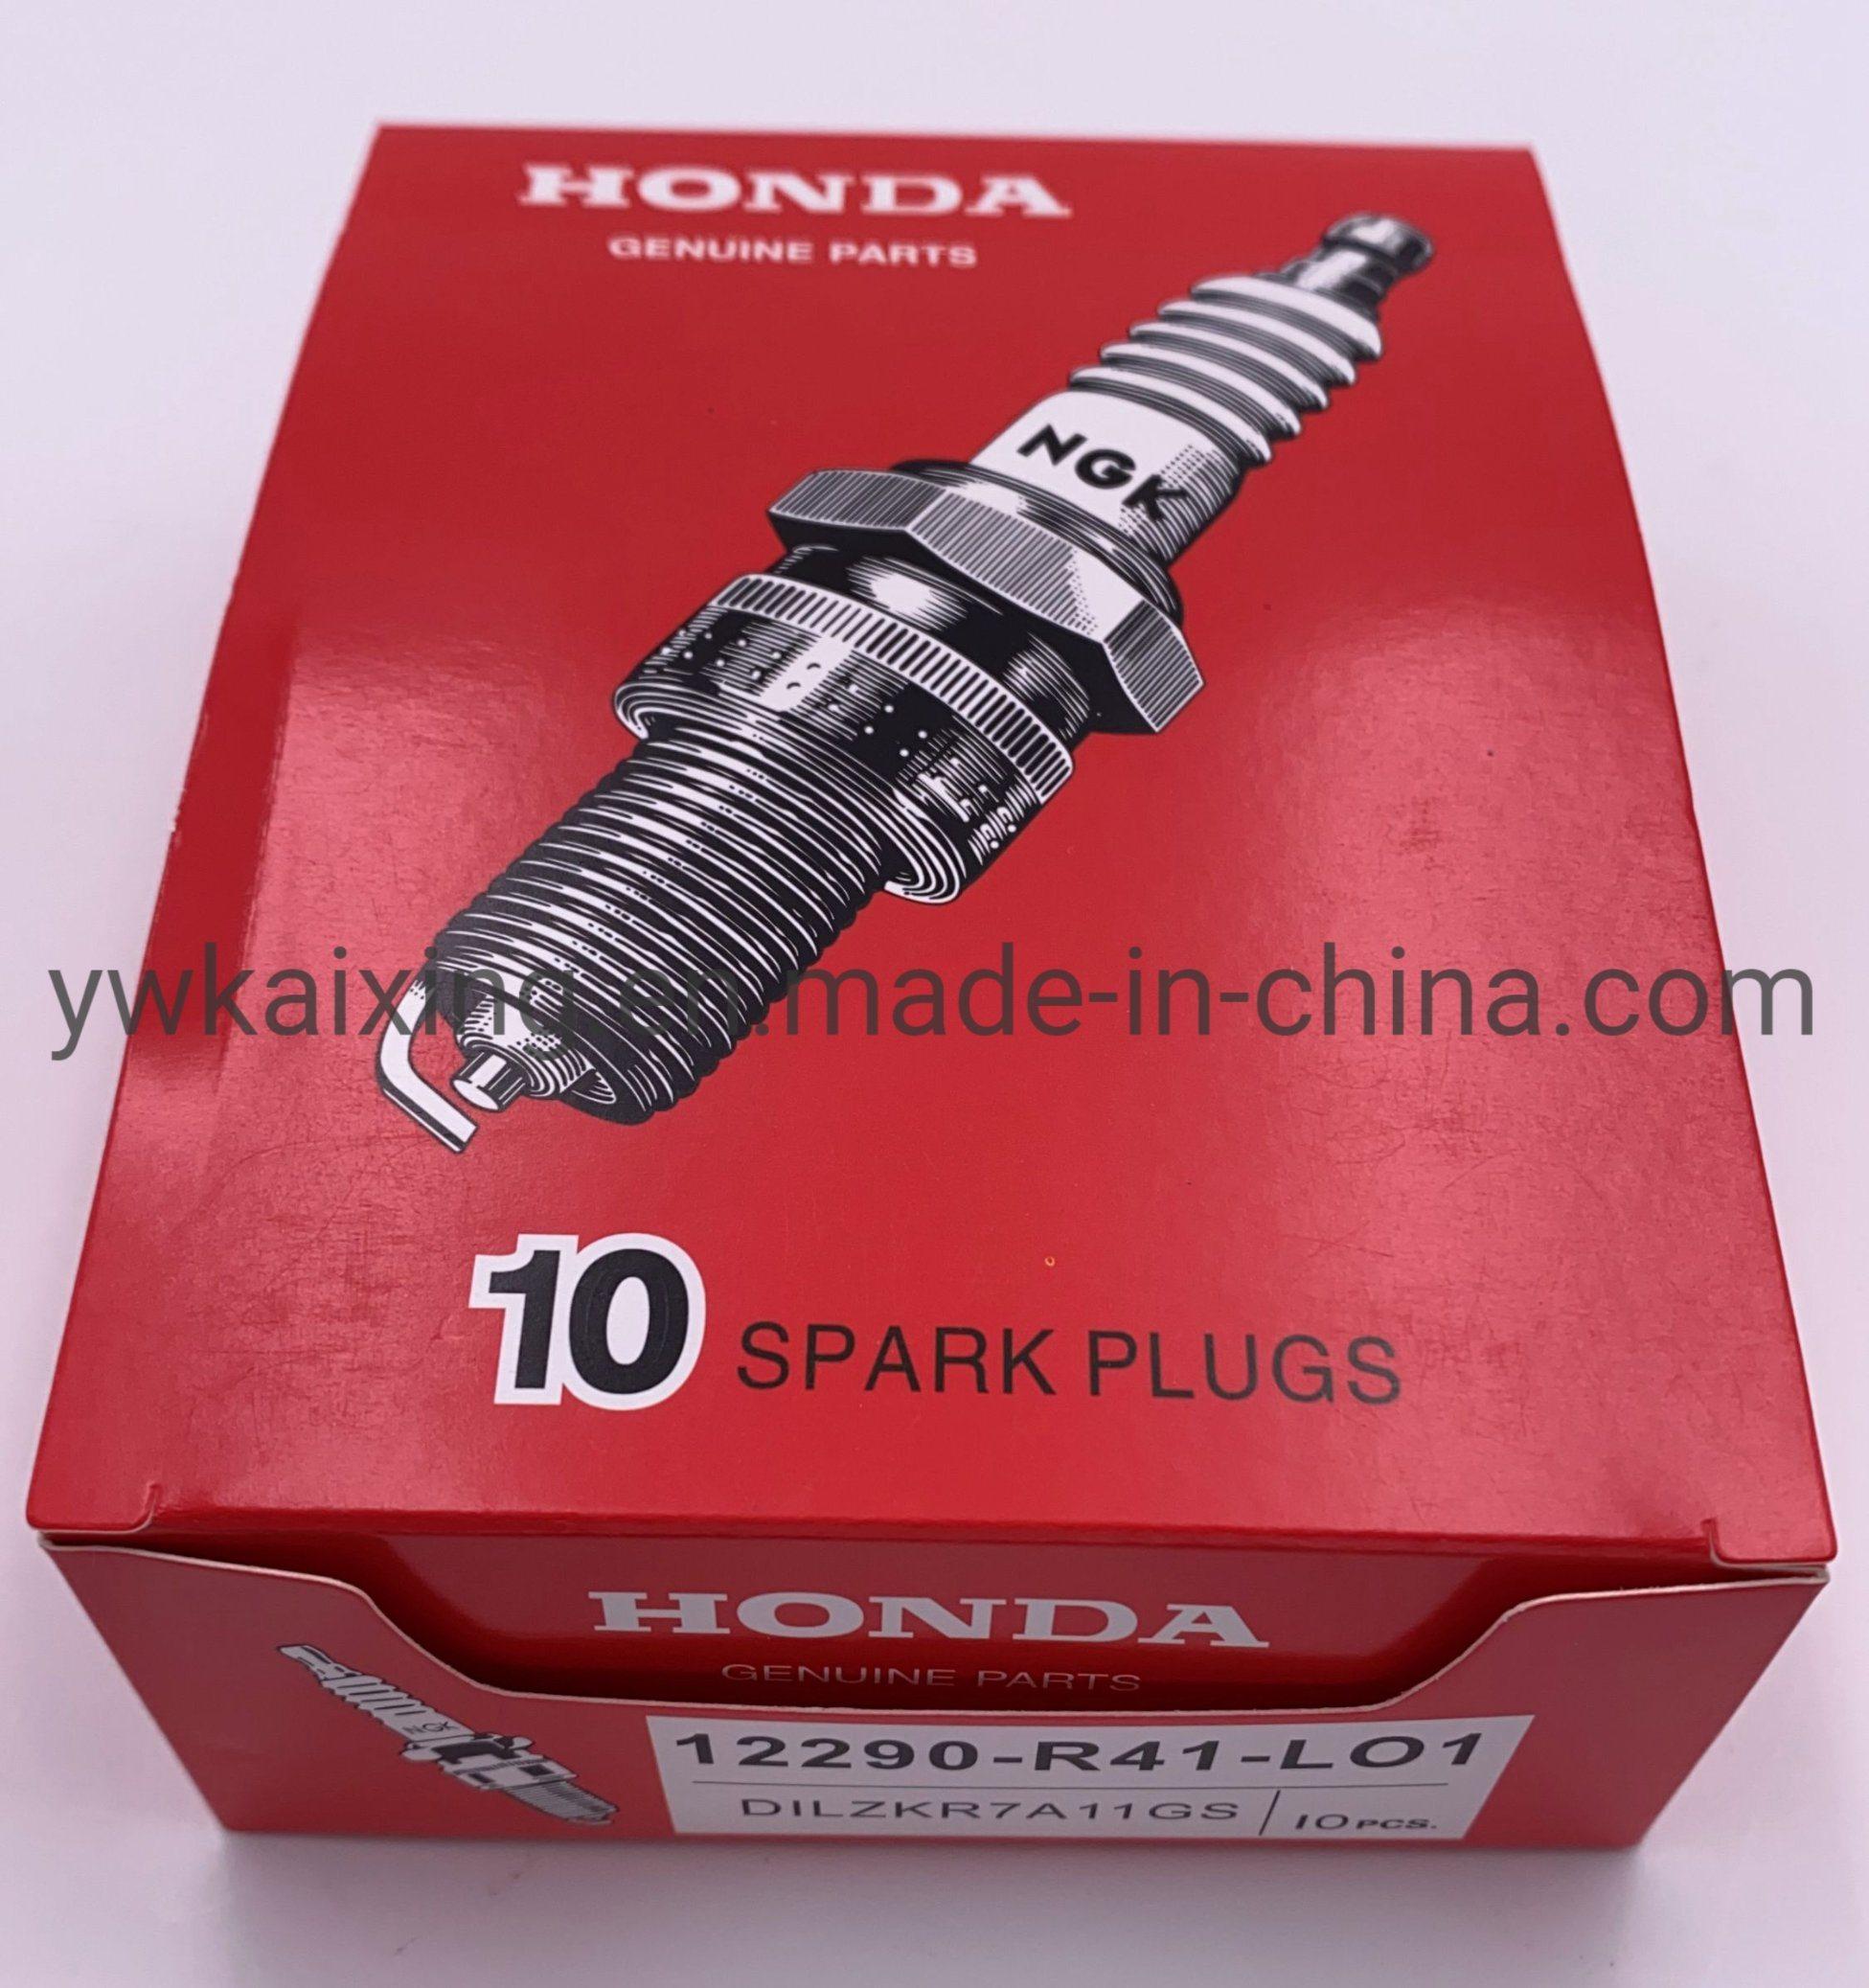 4PC New Iridium Spark Plugs 12290-R41-L01 DILZKR7A-11GS for Honda Accord Acura